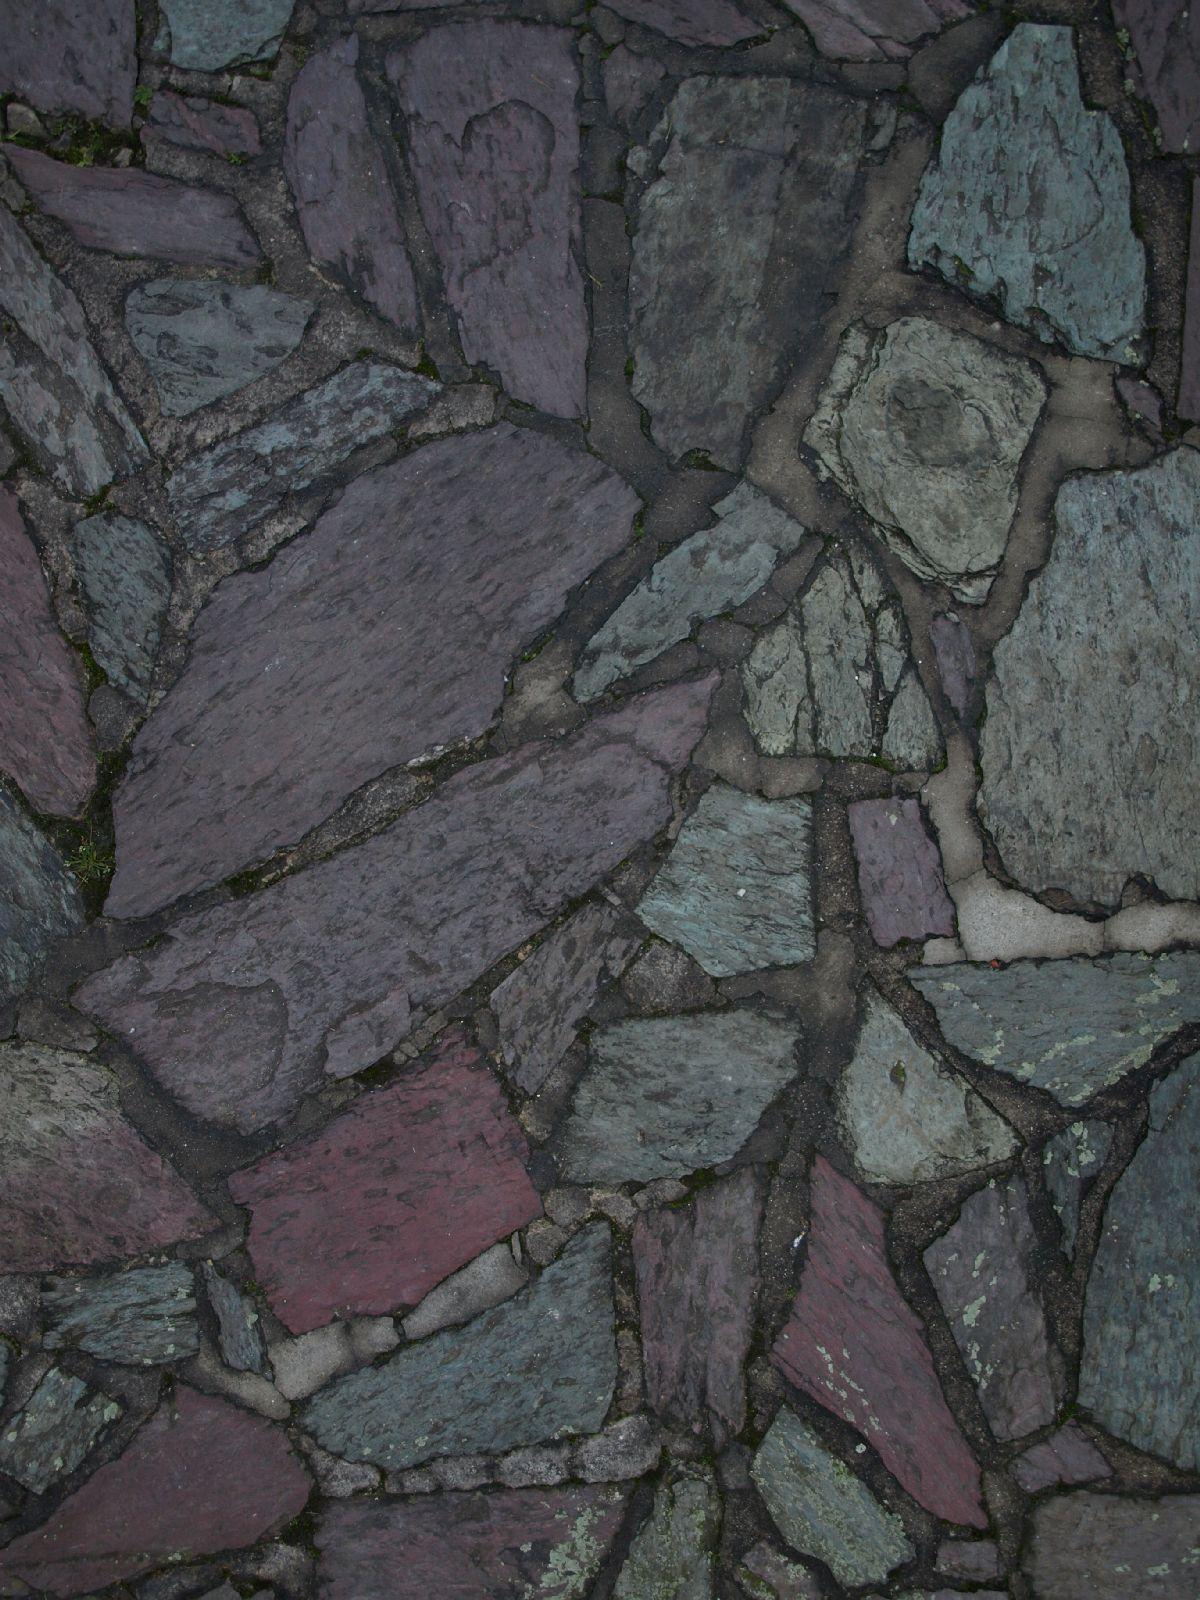 Ground-Urban_Texture_A_PC258291